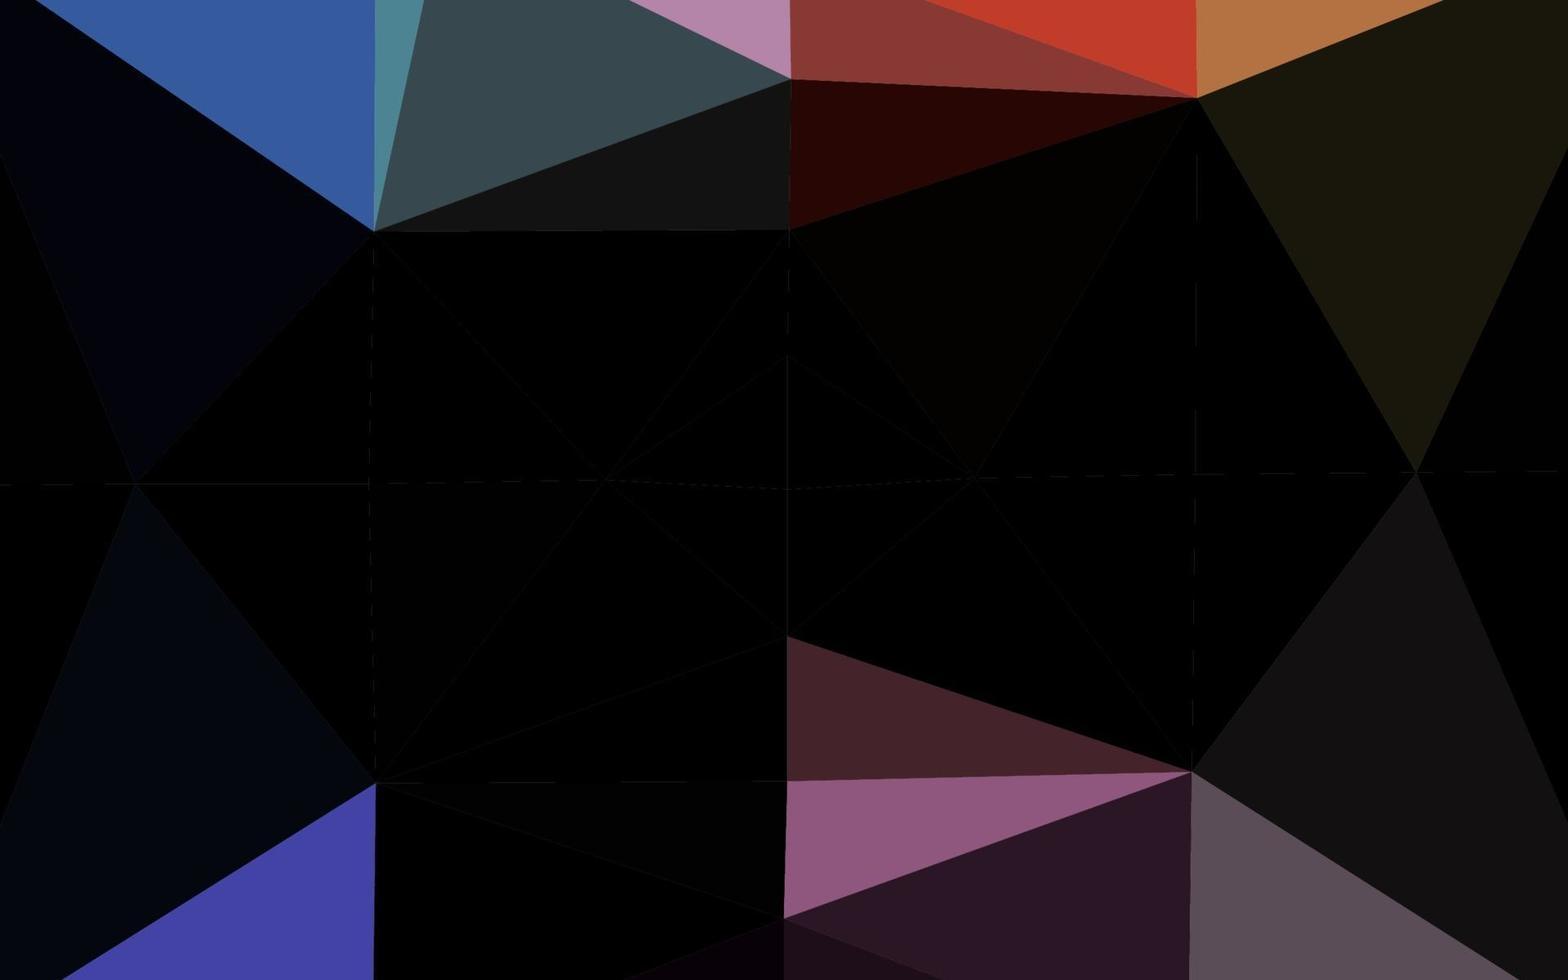 luz multicolor, padrão de triângulo embaçado de vetor de arco-íris.